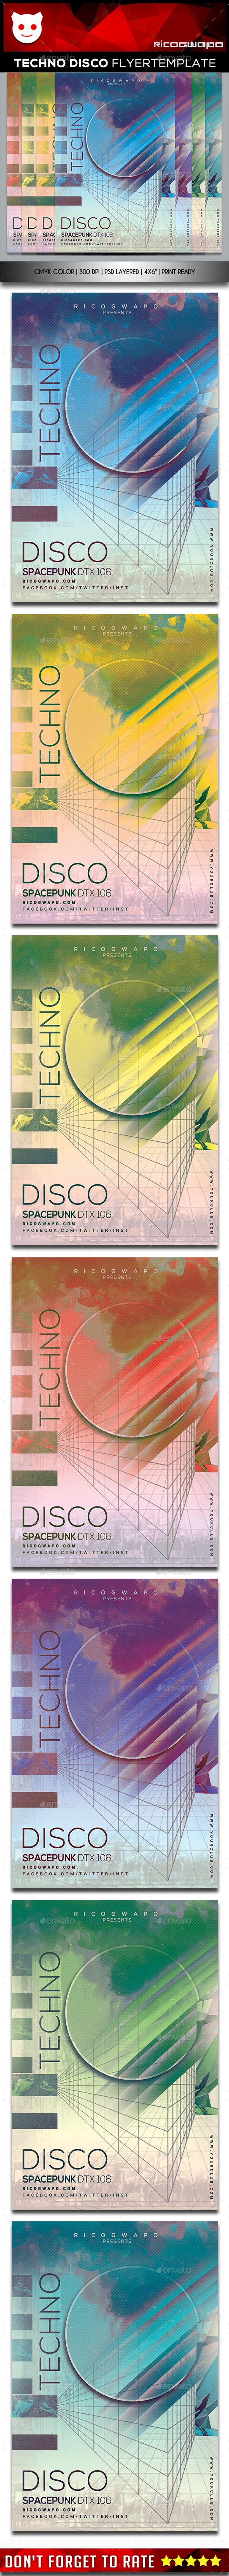 Techno Disco Flyer Template - Flyers Print Templates